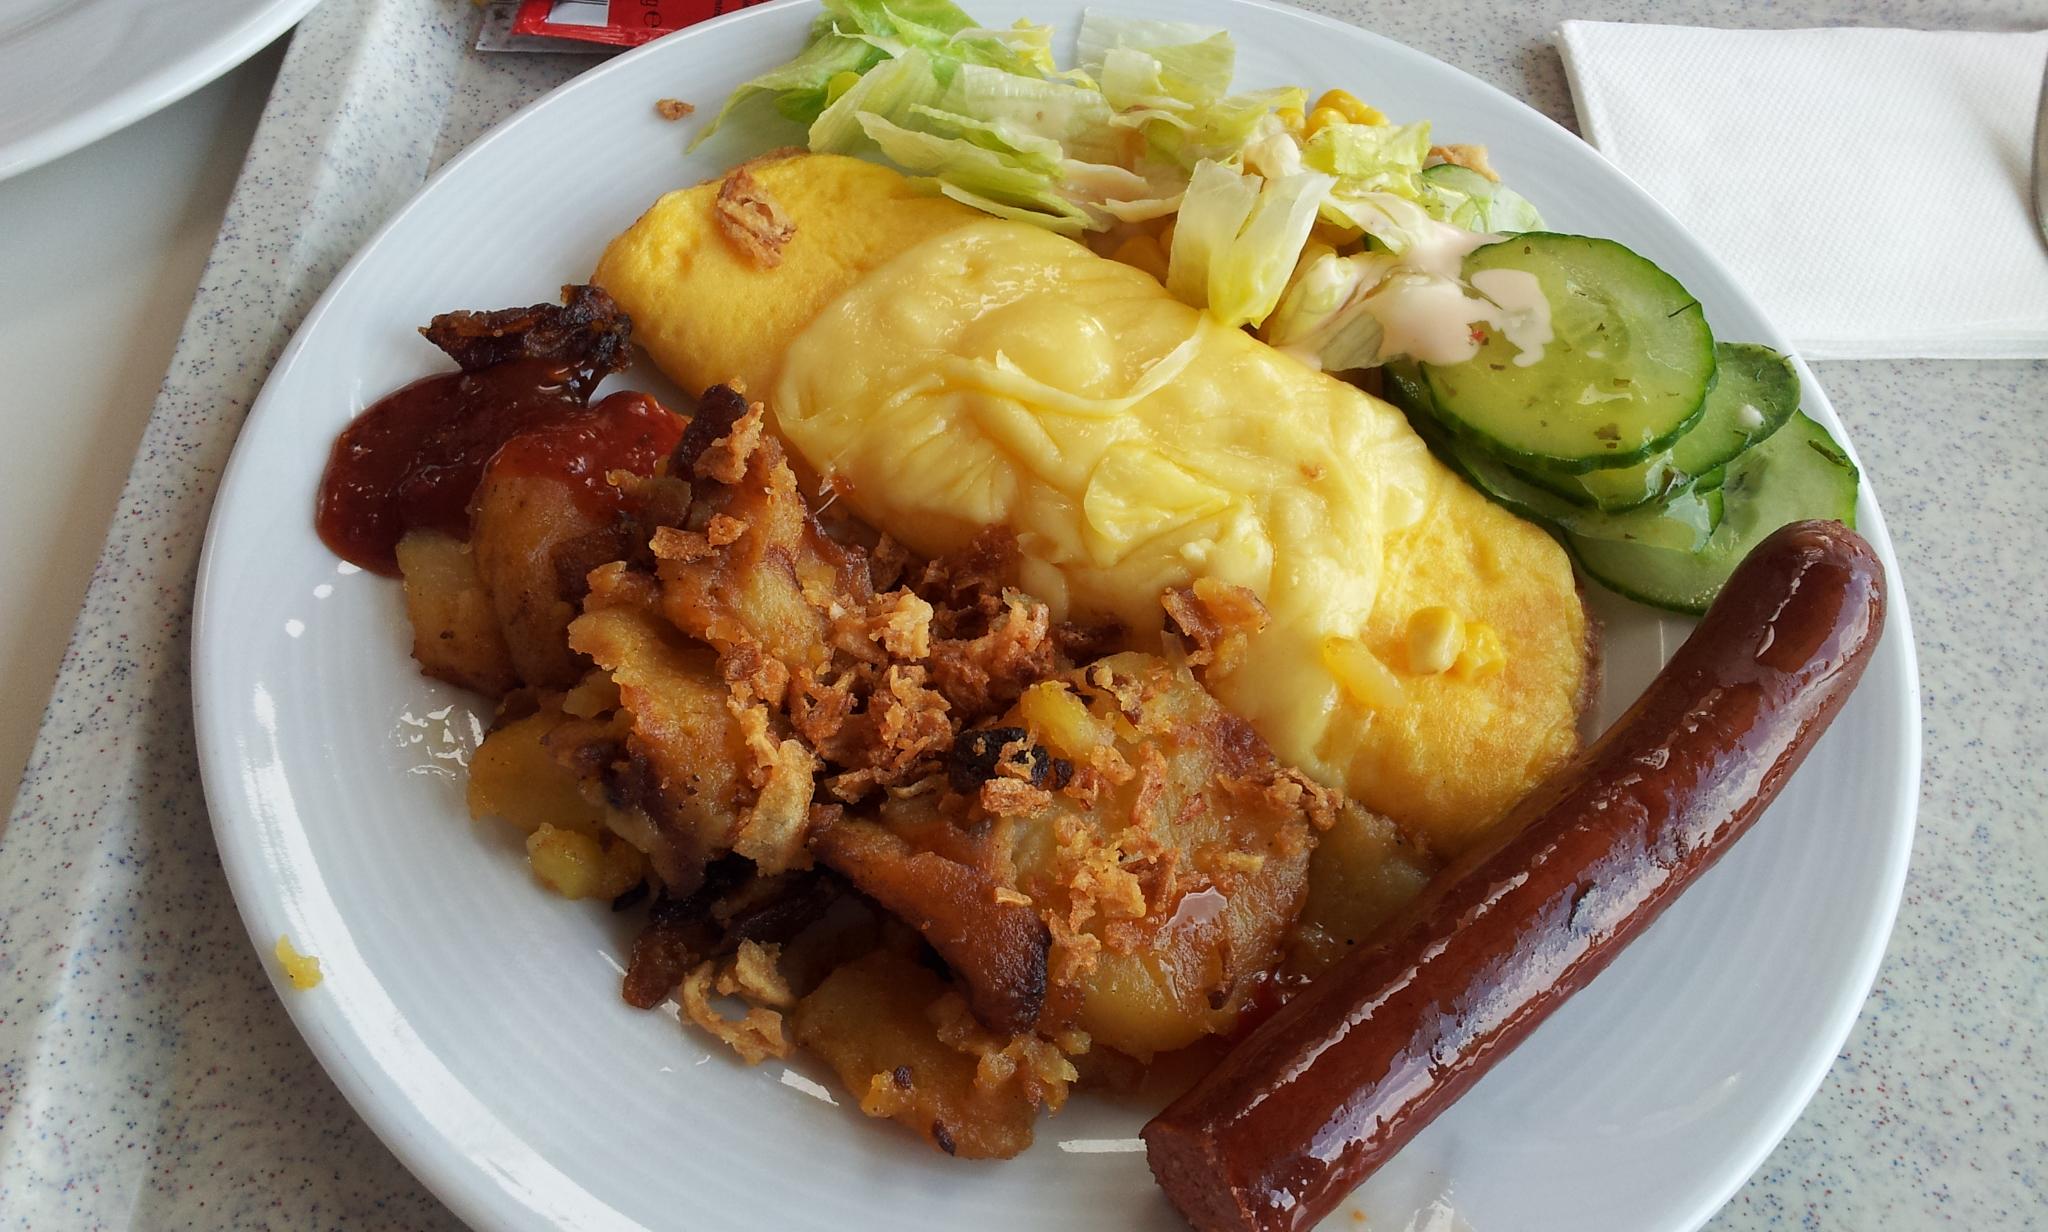 http://foodloader.net/Holz_2012-04-16_Rindswurst_mit_Omelette_und_Bratkartoffeln.jpg